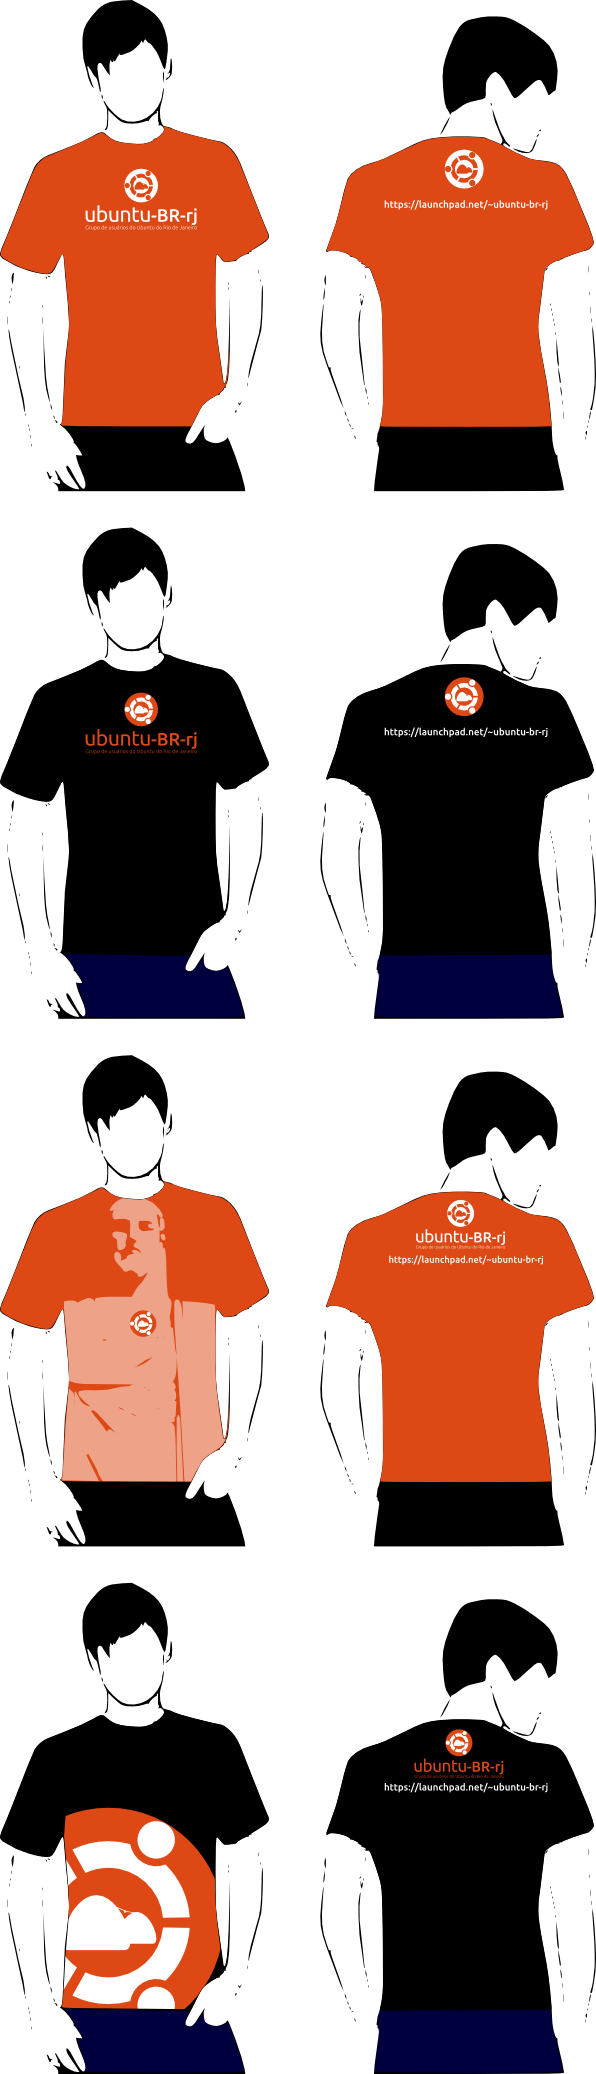 Ubuntu BR – RJ